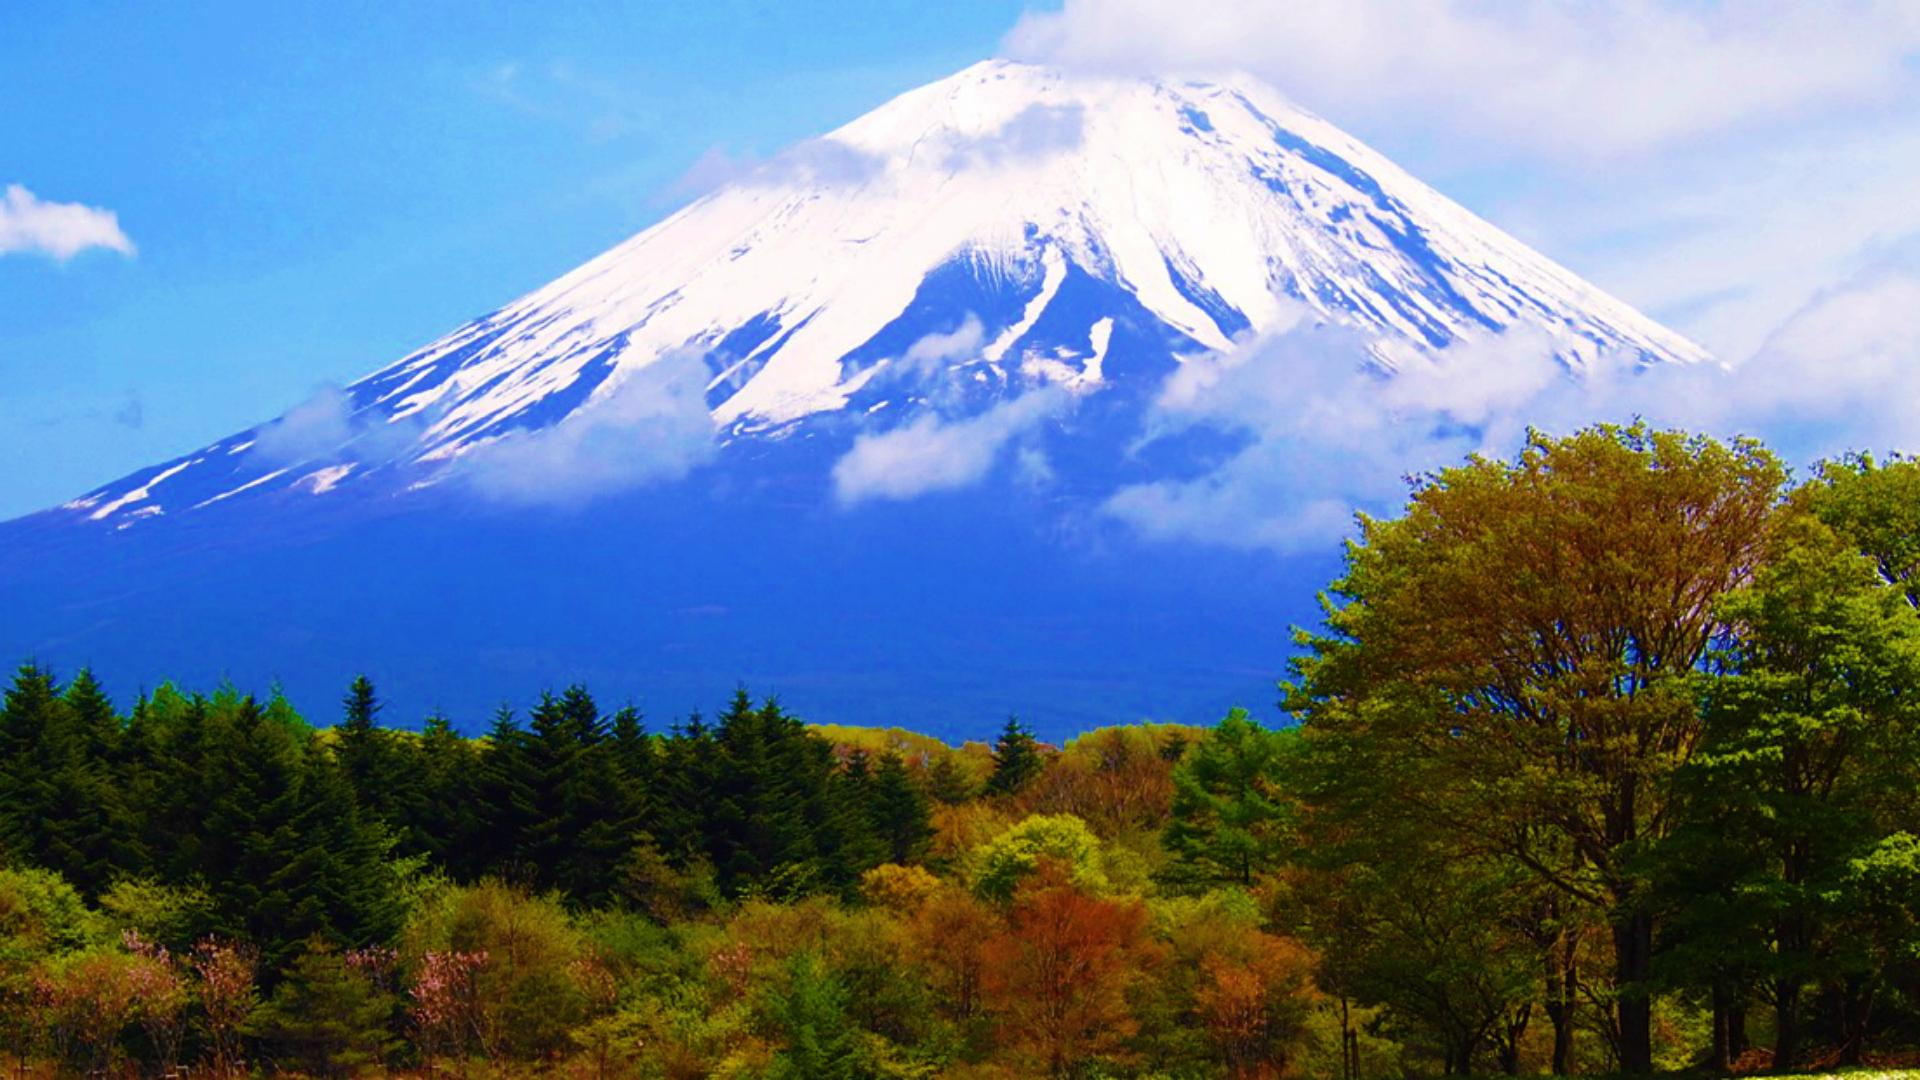 Hd Japan Wallpapers 1080p: 38 Beautiful Japan Wallpapers-The Land Of Rising Sun